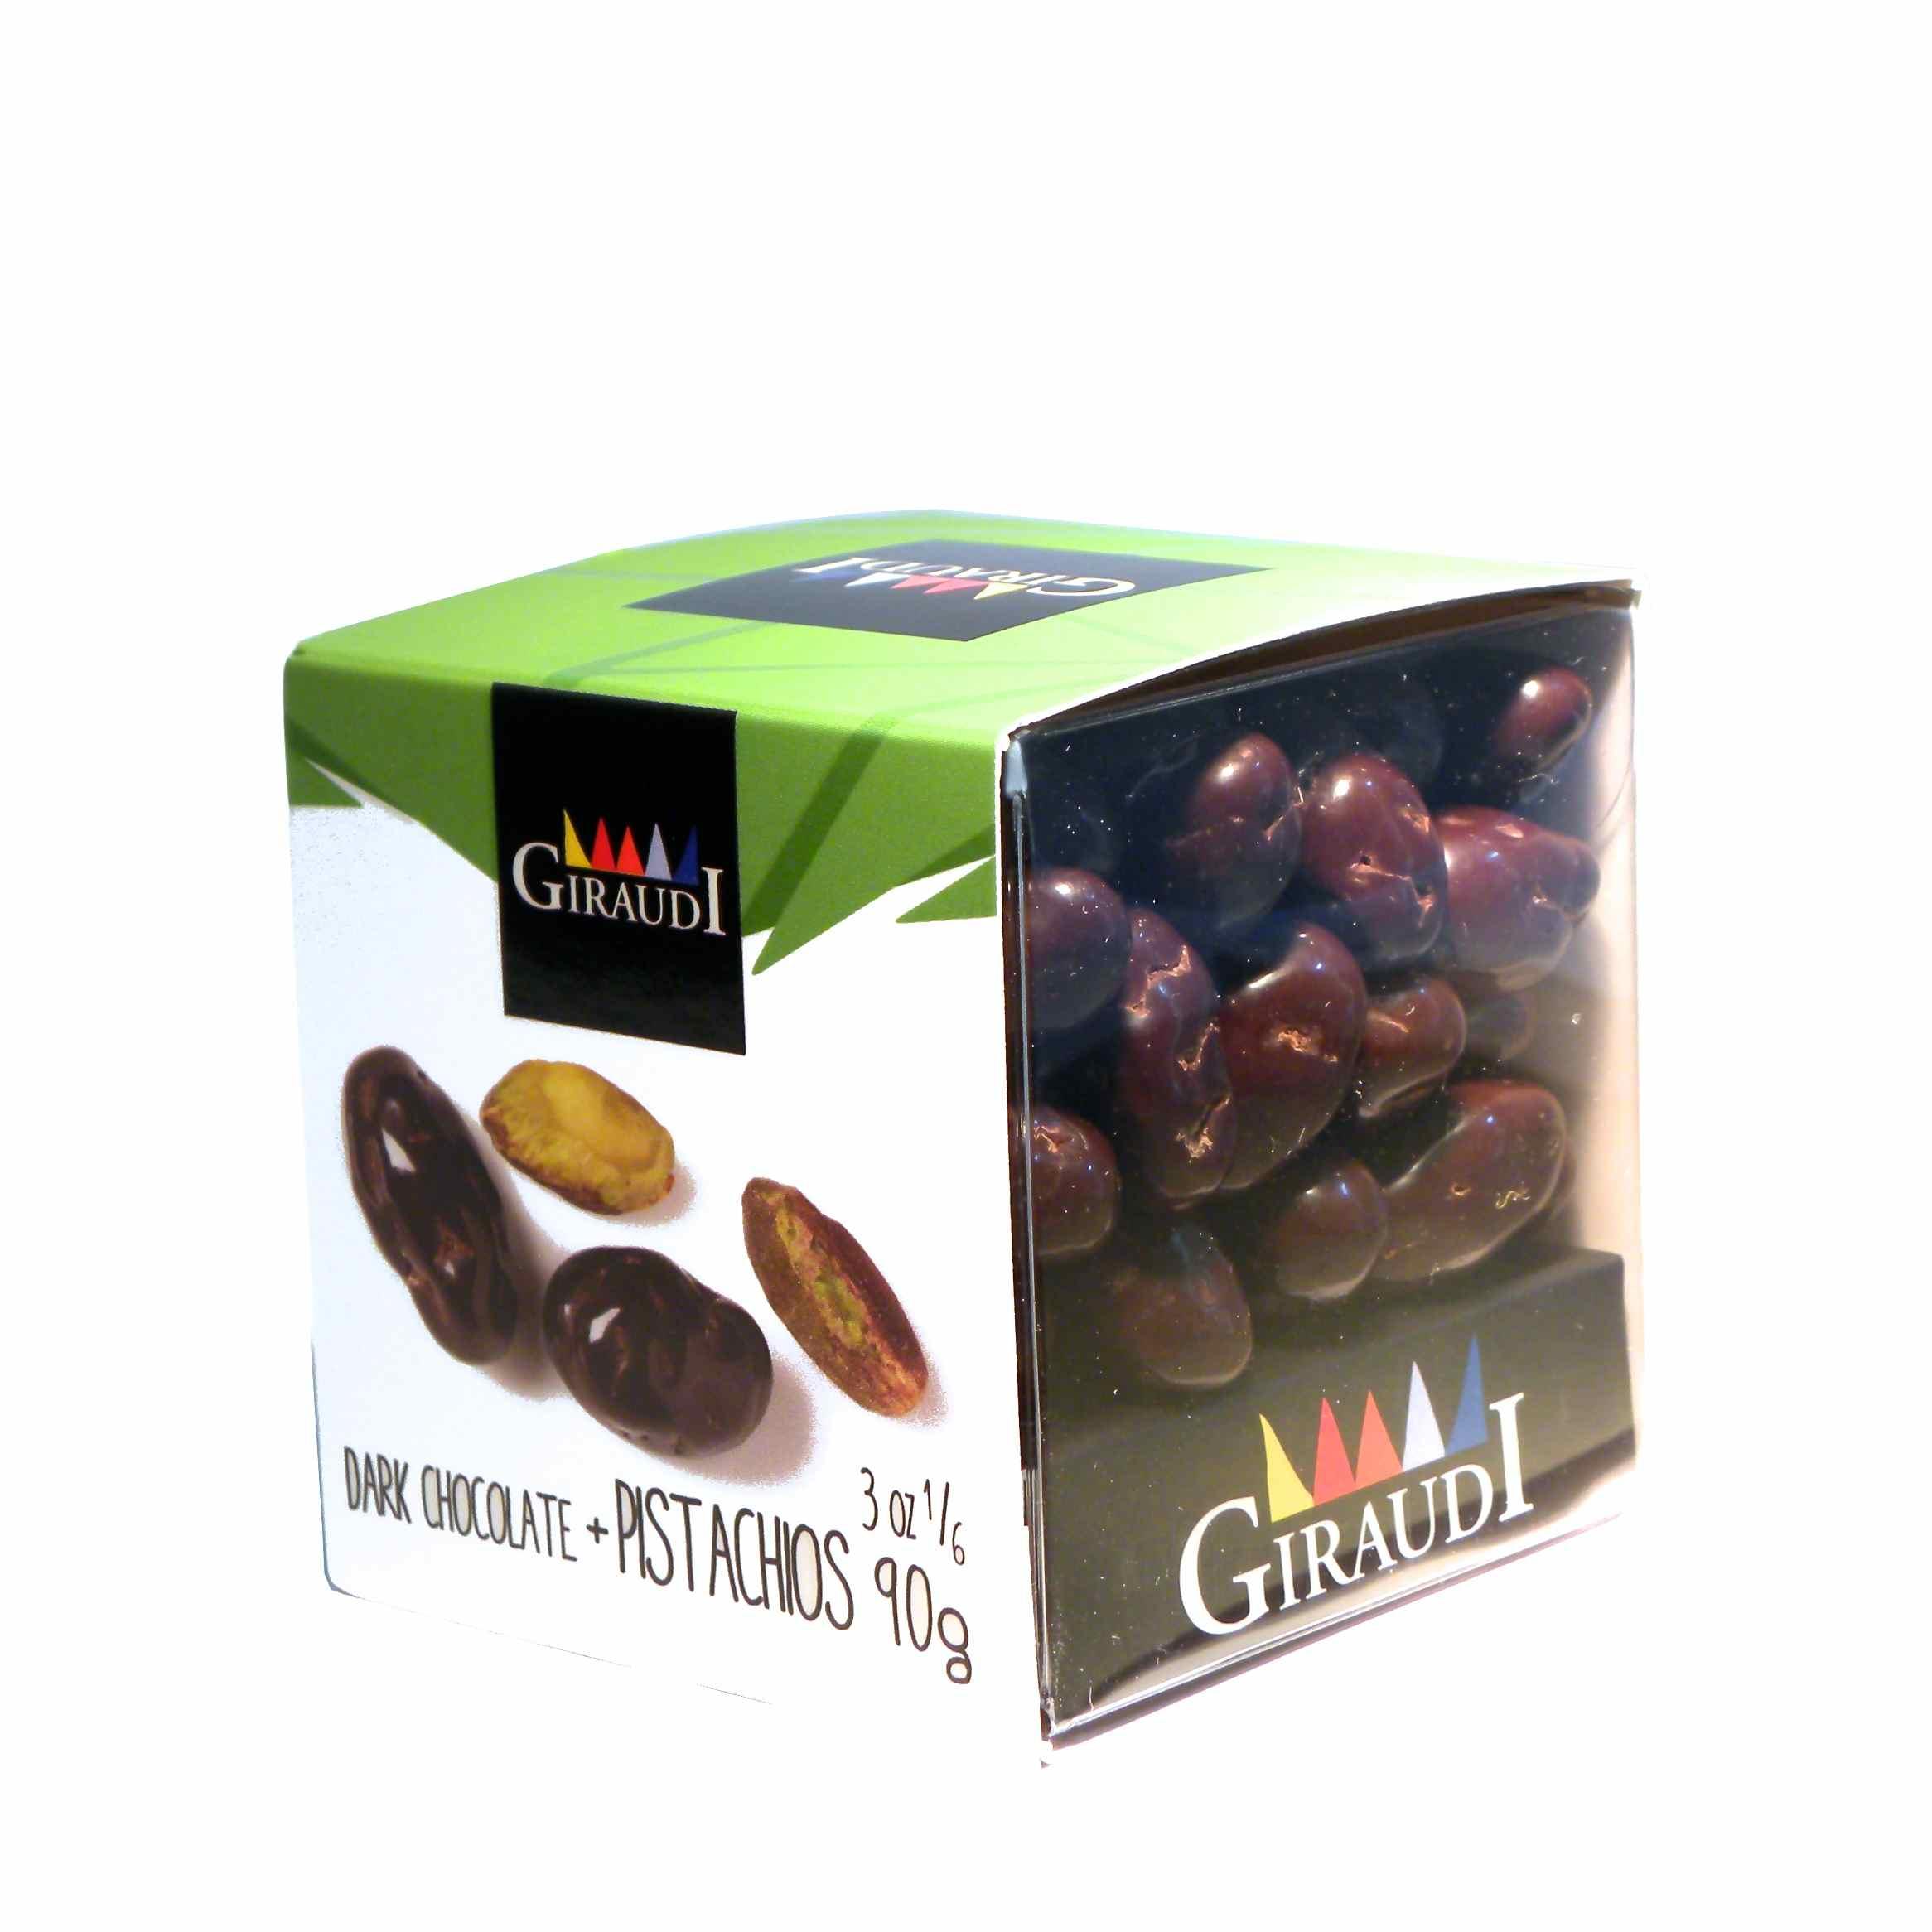 Giraudi dark chocolate pistachios – Giraudi dragee cioccolato fondente pistacchi – Gustorotondo – Italian food boutique